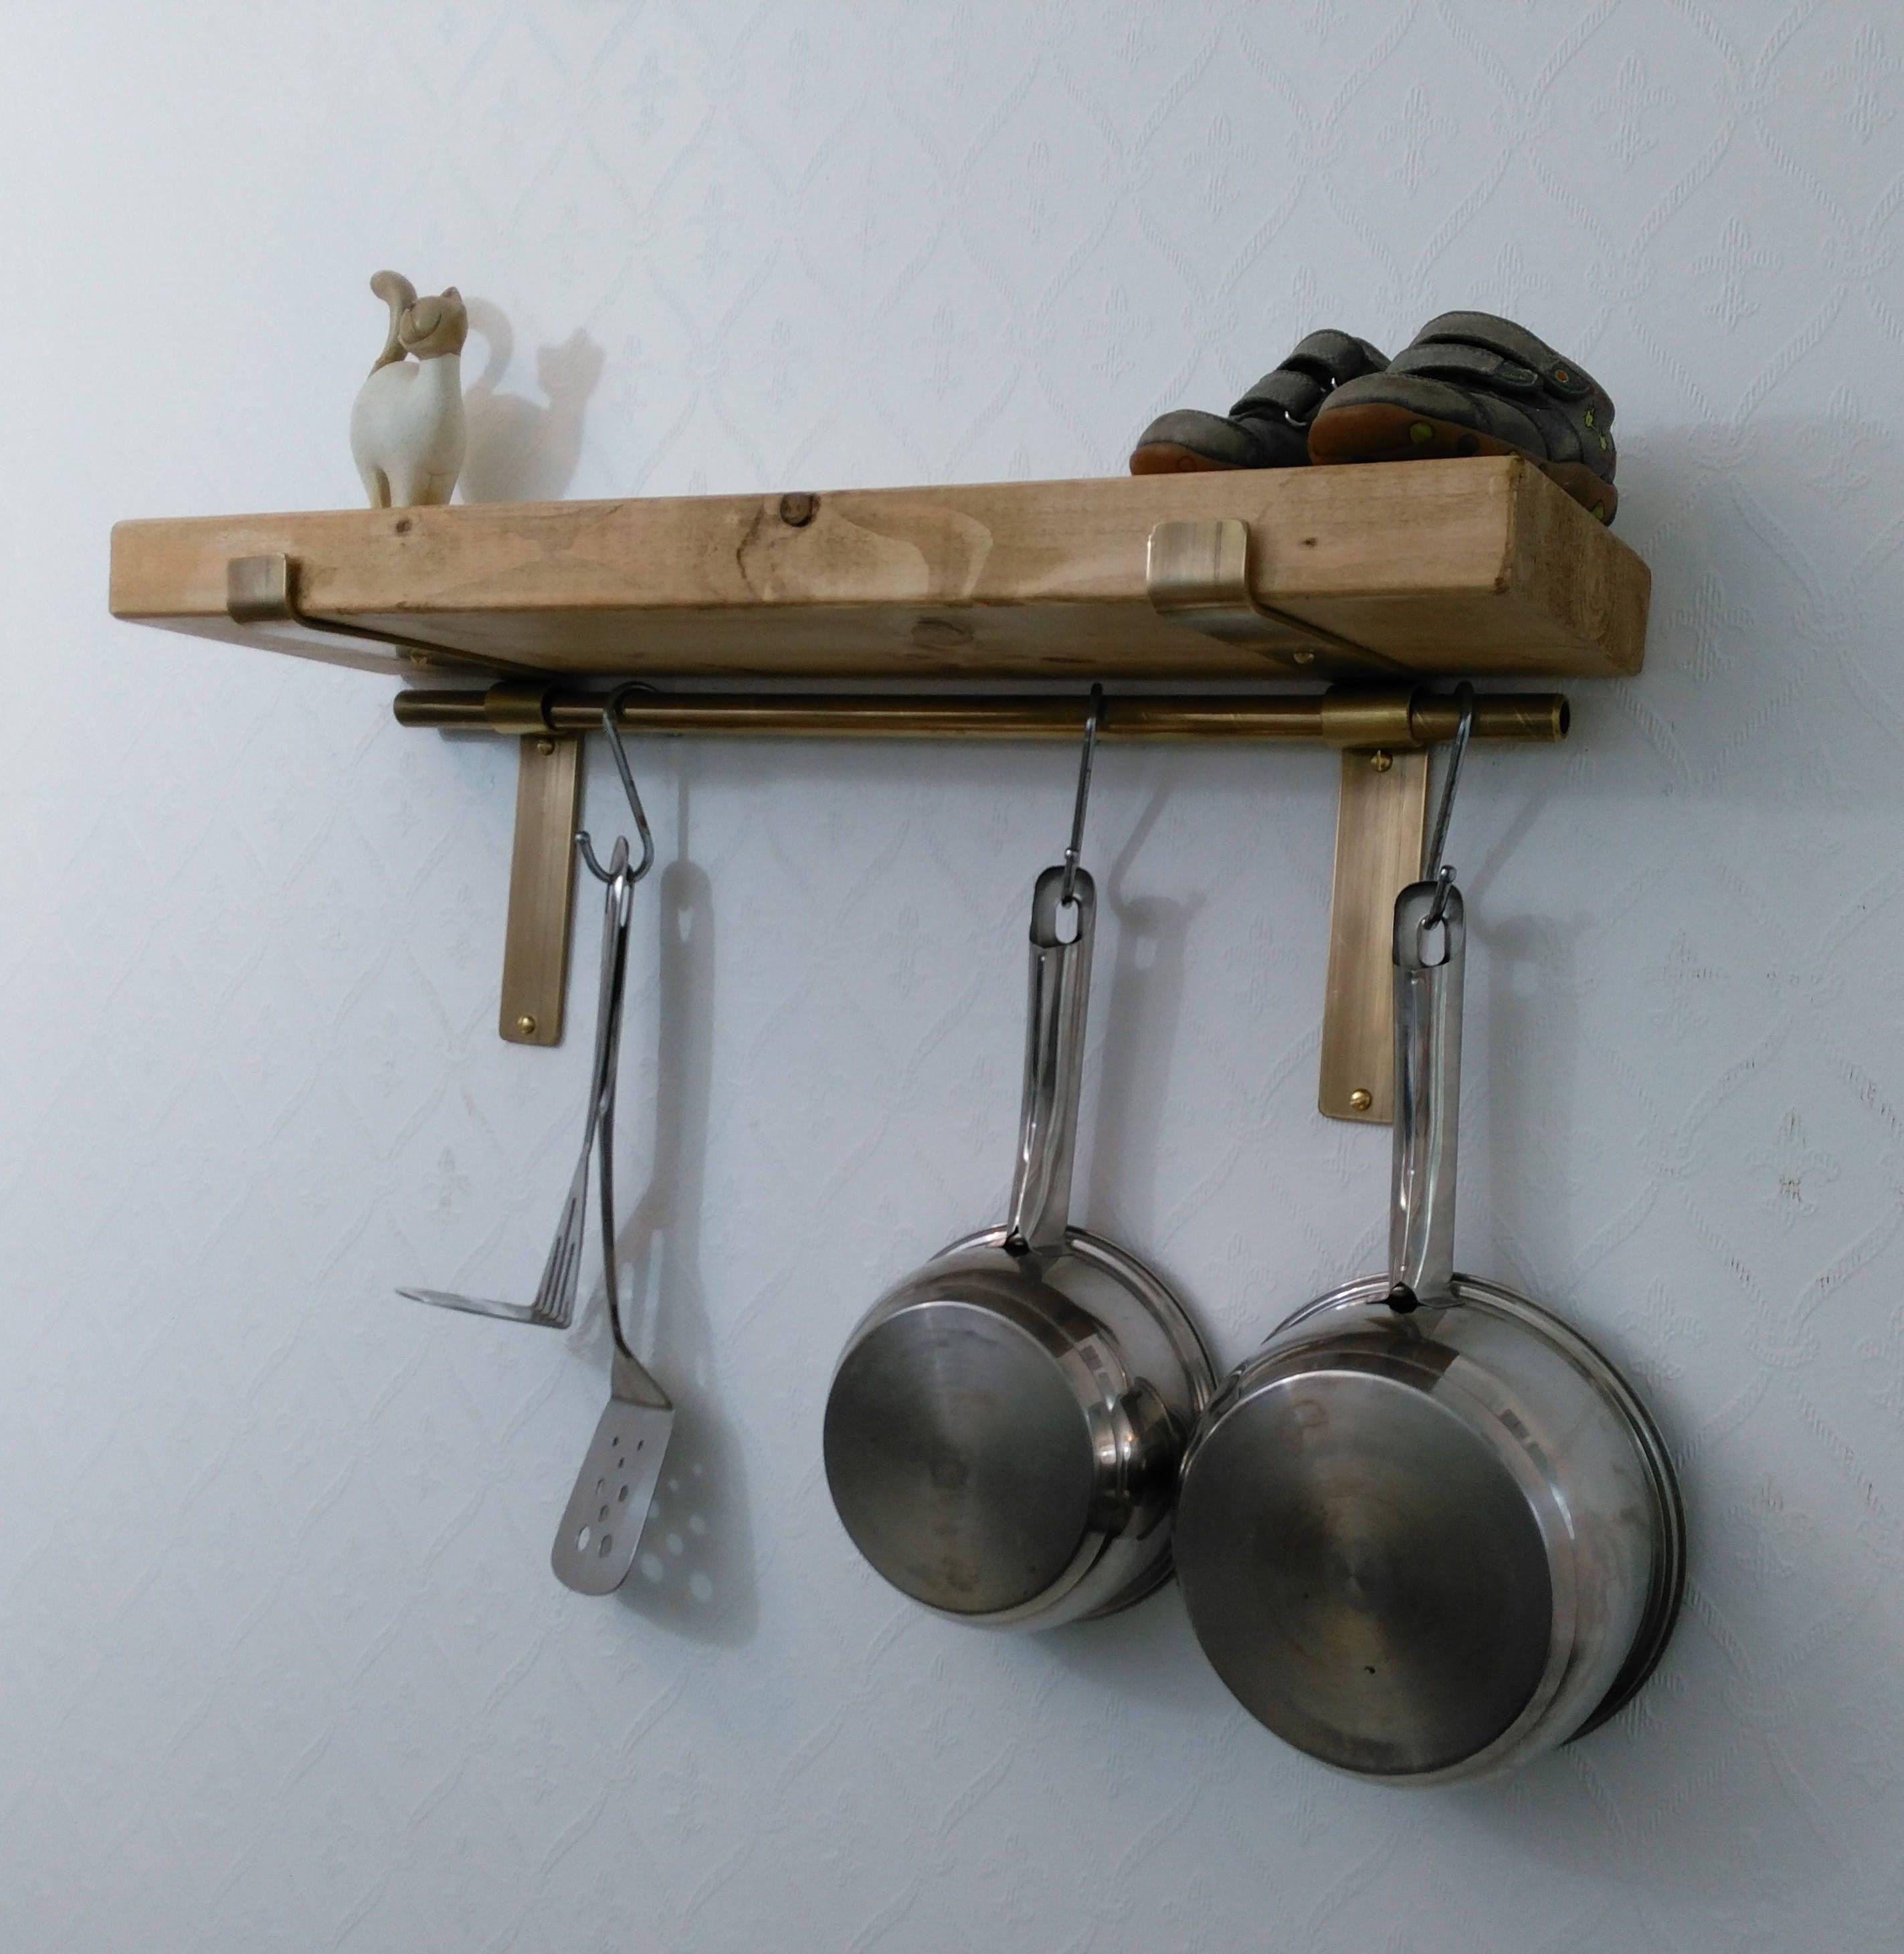 Kuchenregale Rustikal Regal Komplett Mit Messing Pfanne Stange Etsy Rustic Shelves Kitchen Shelves Solid Wood Kitchens